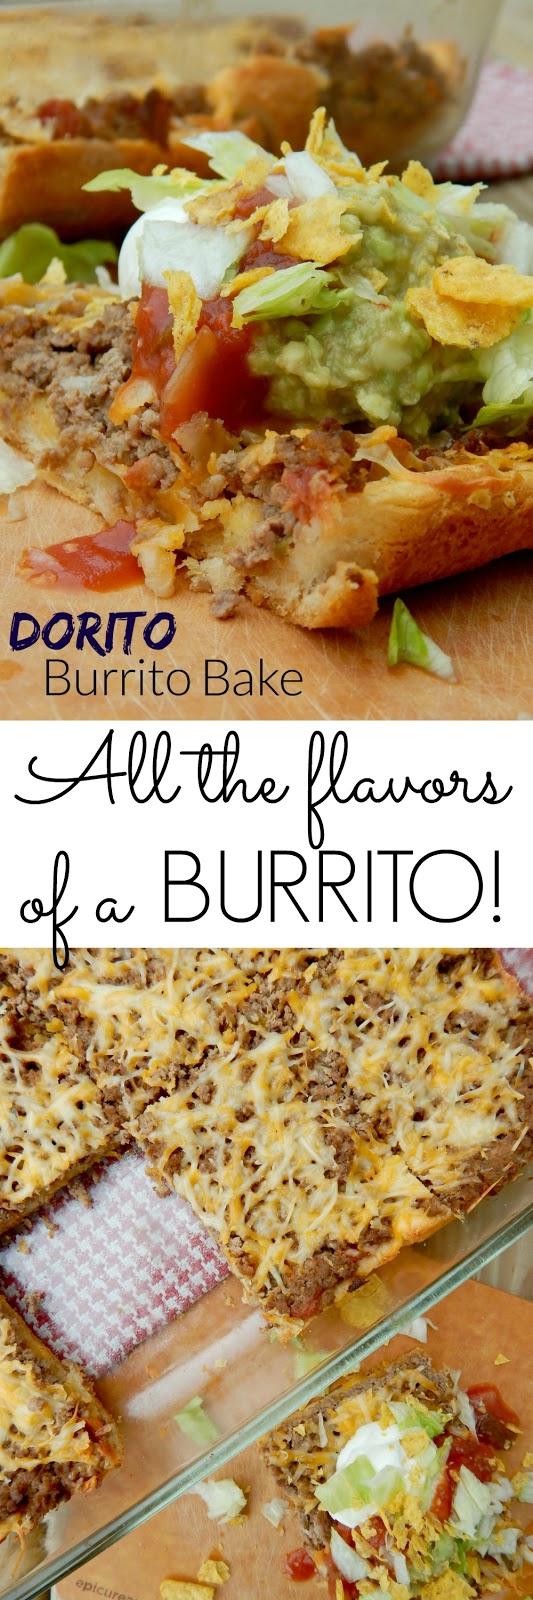 dorit burrito bake (sweetandsavoryfood.com)